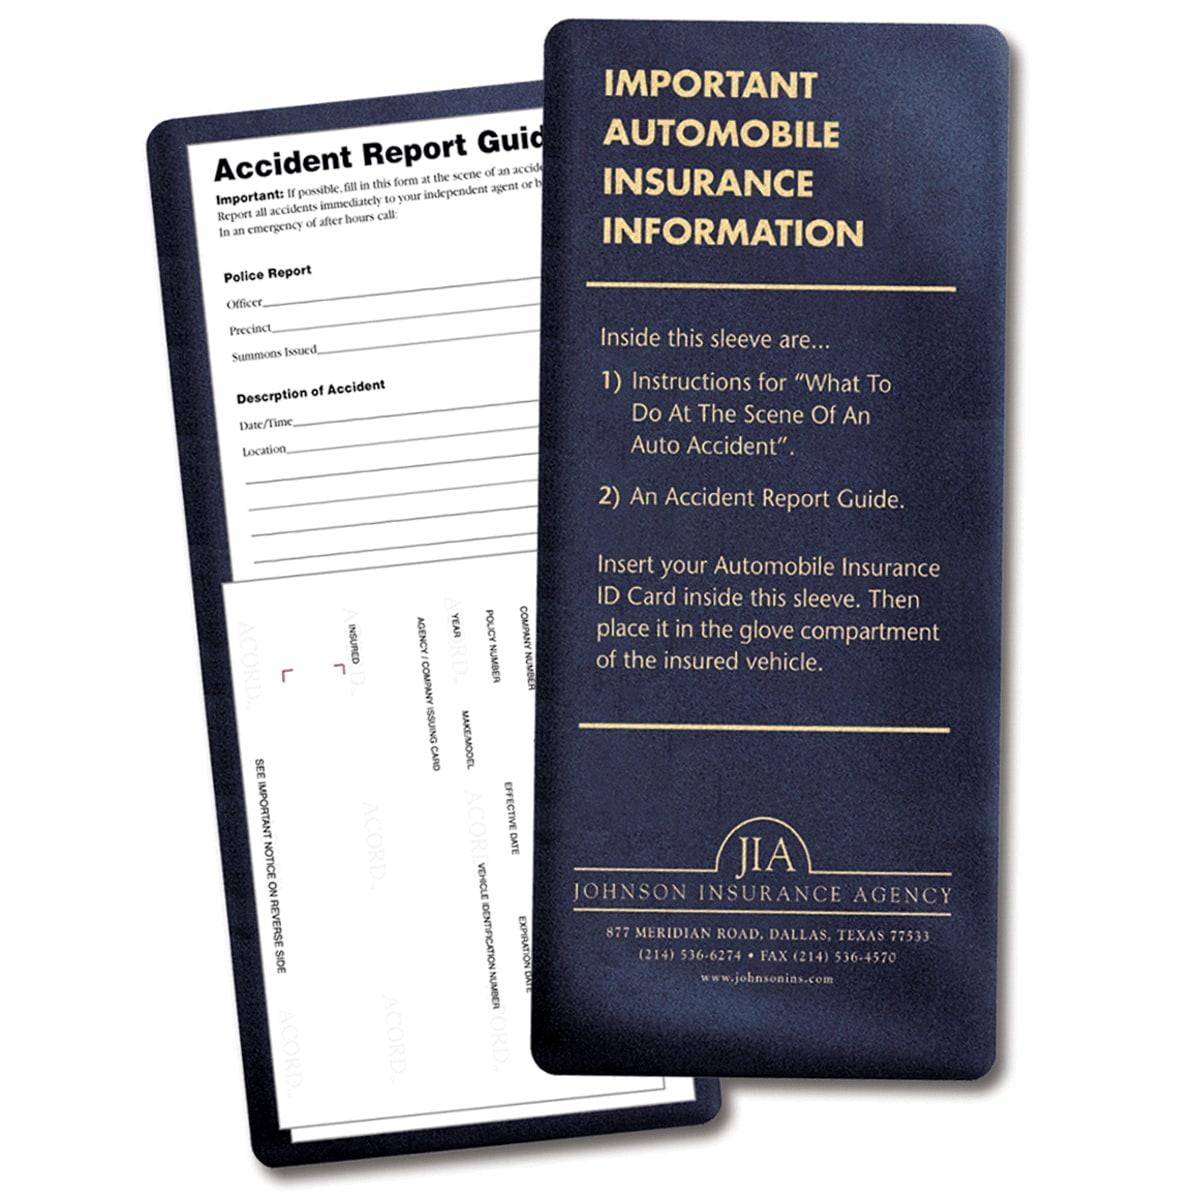 picture of insurance card holder kit - Insurance Card Holder